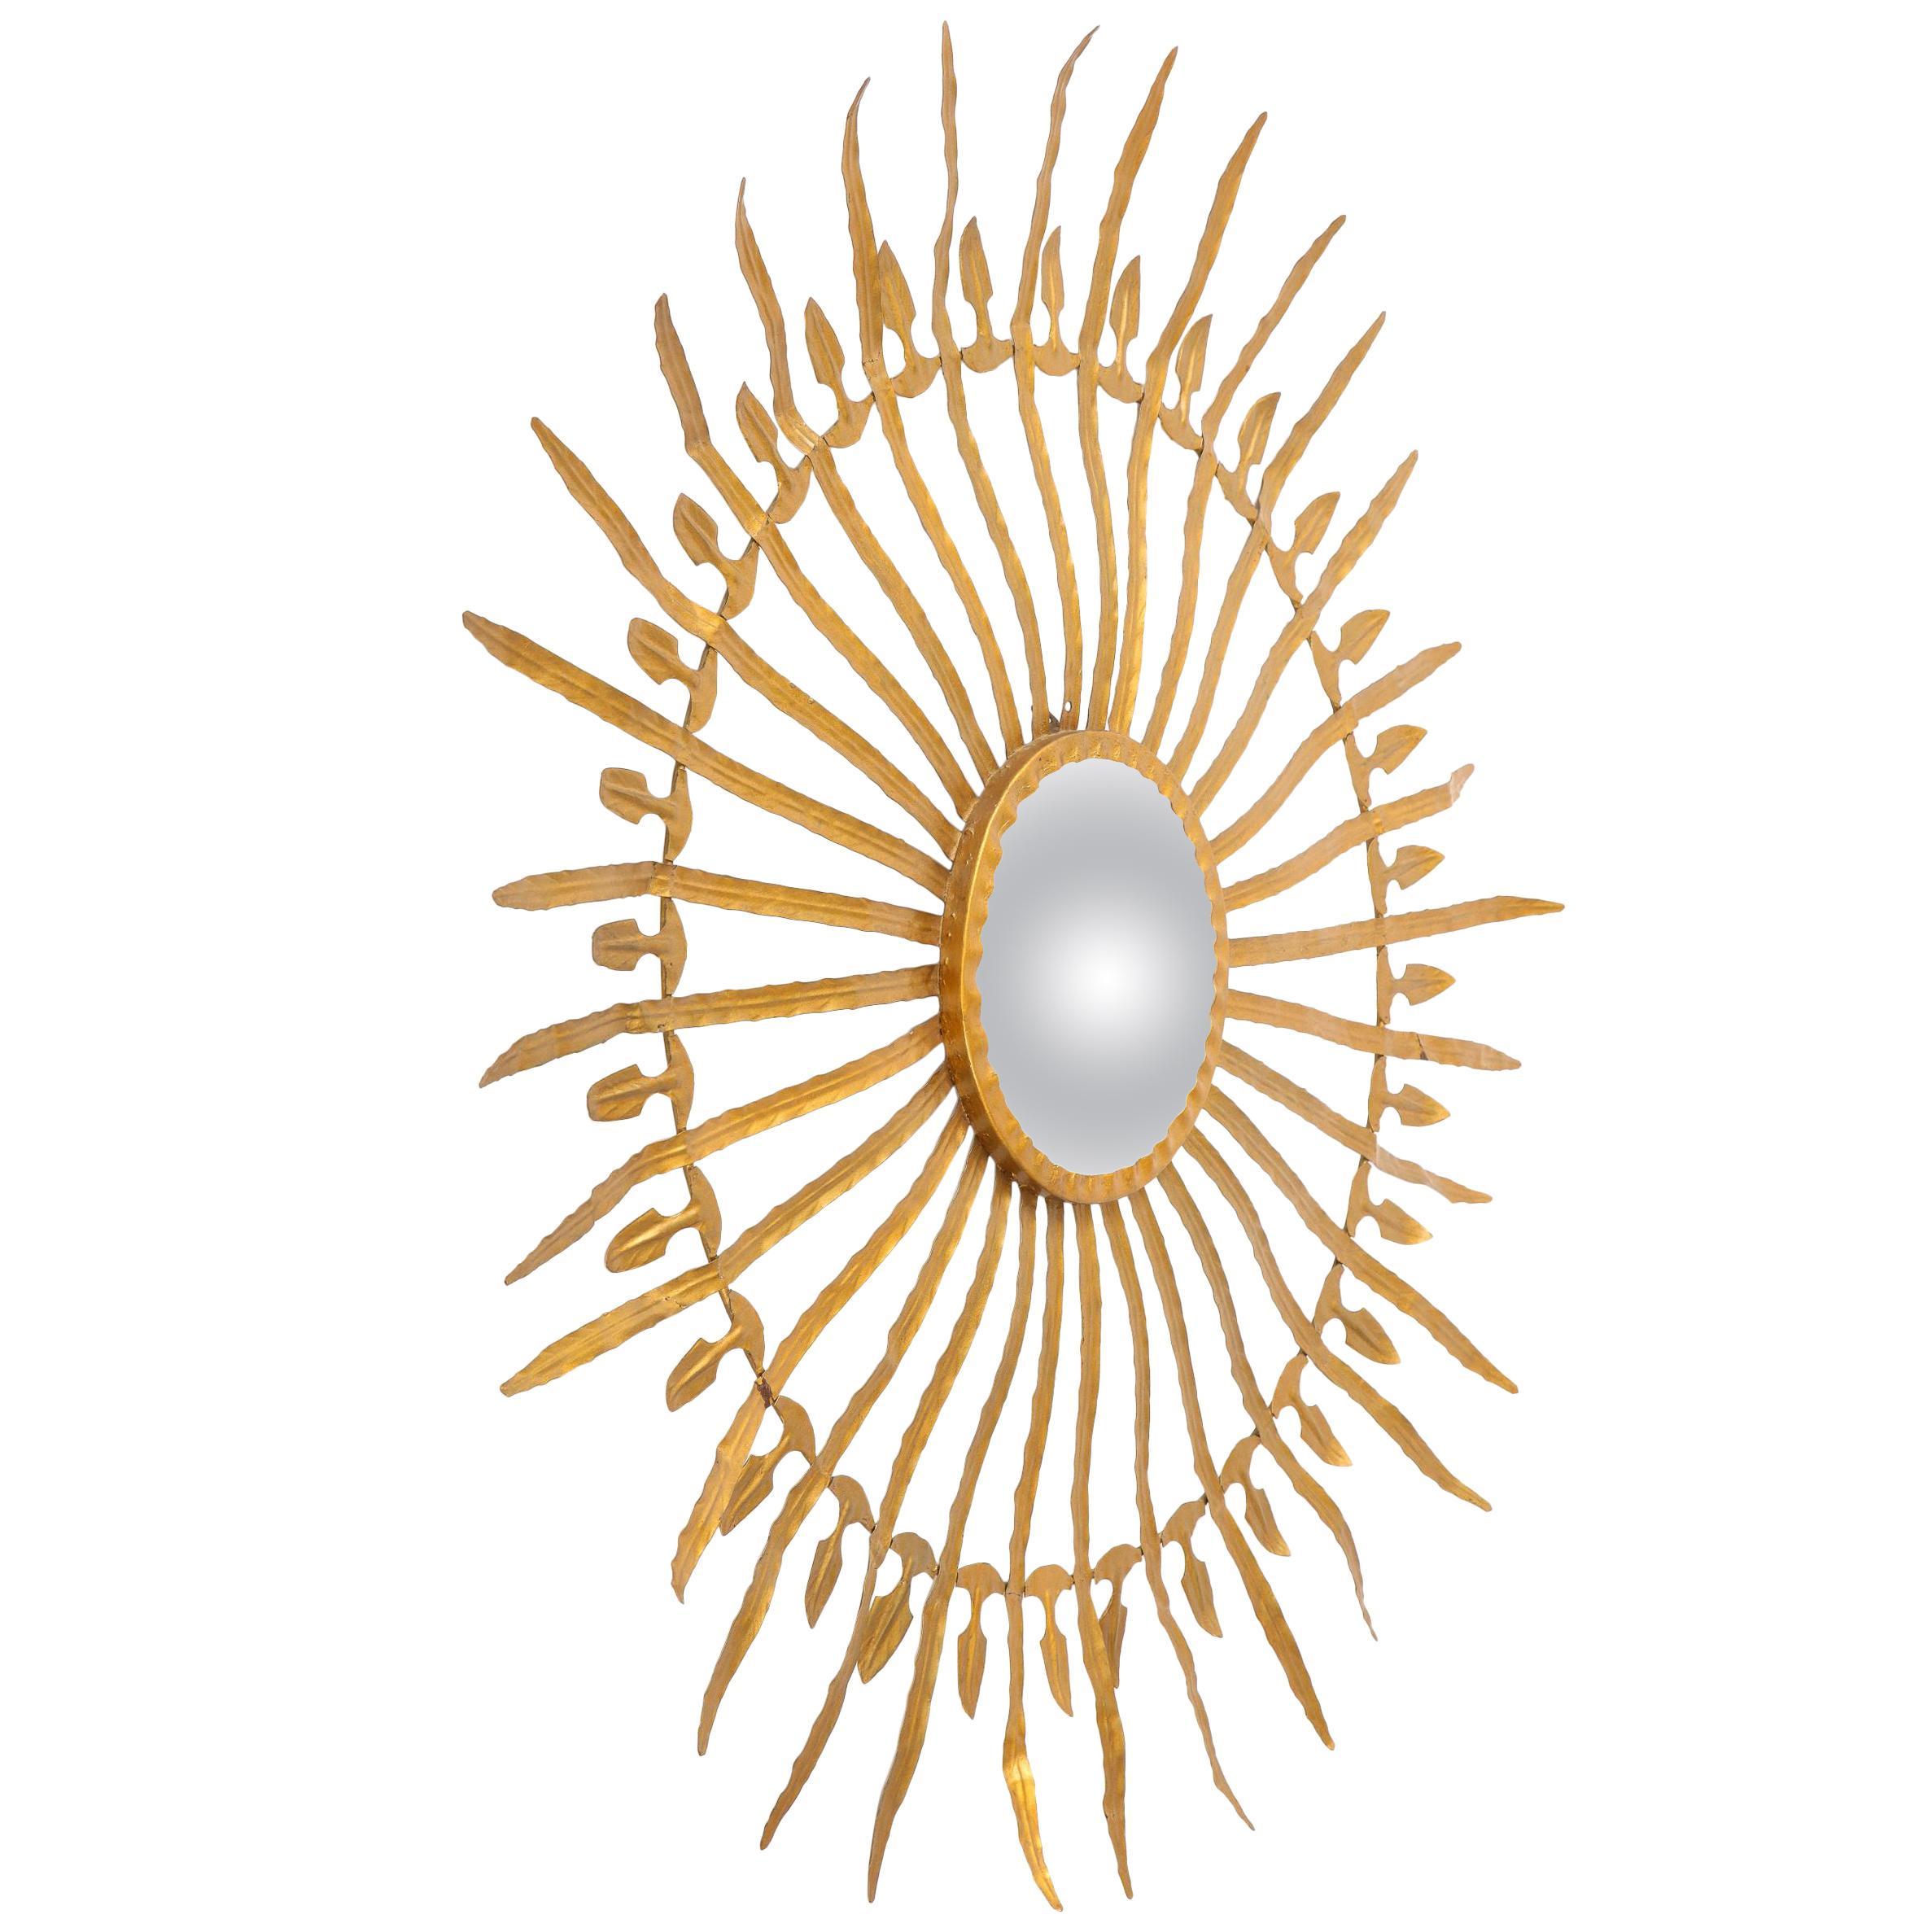 20th Century Gilded Sunburst Tole Mirror